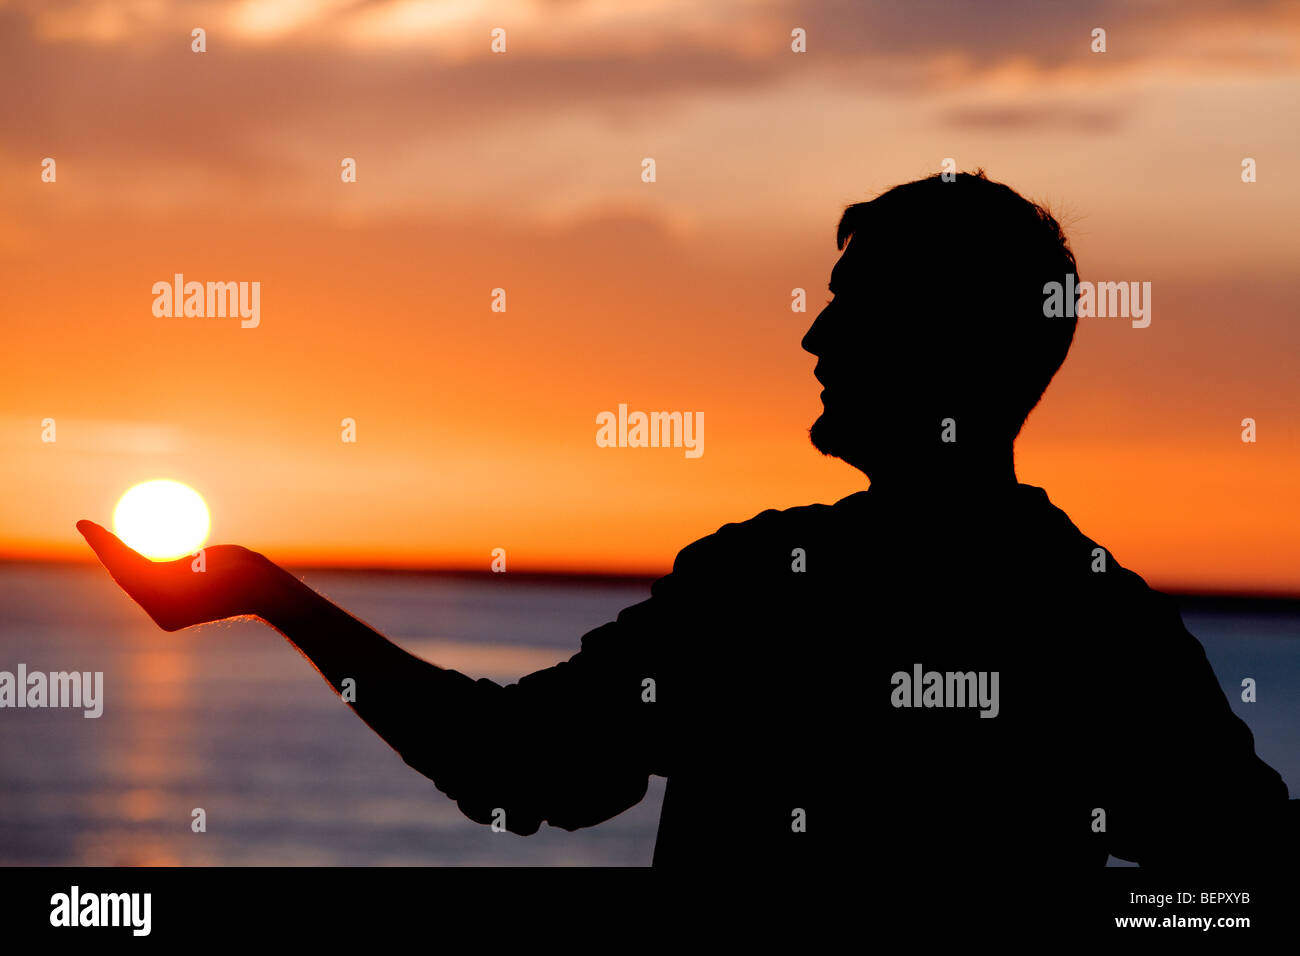 Man holding the sun. - Stock Image